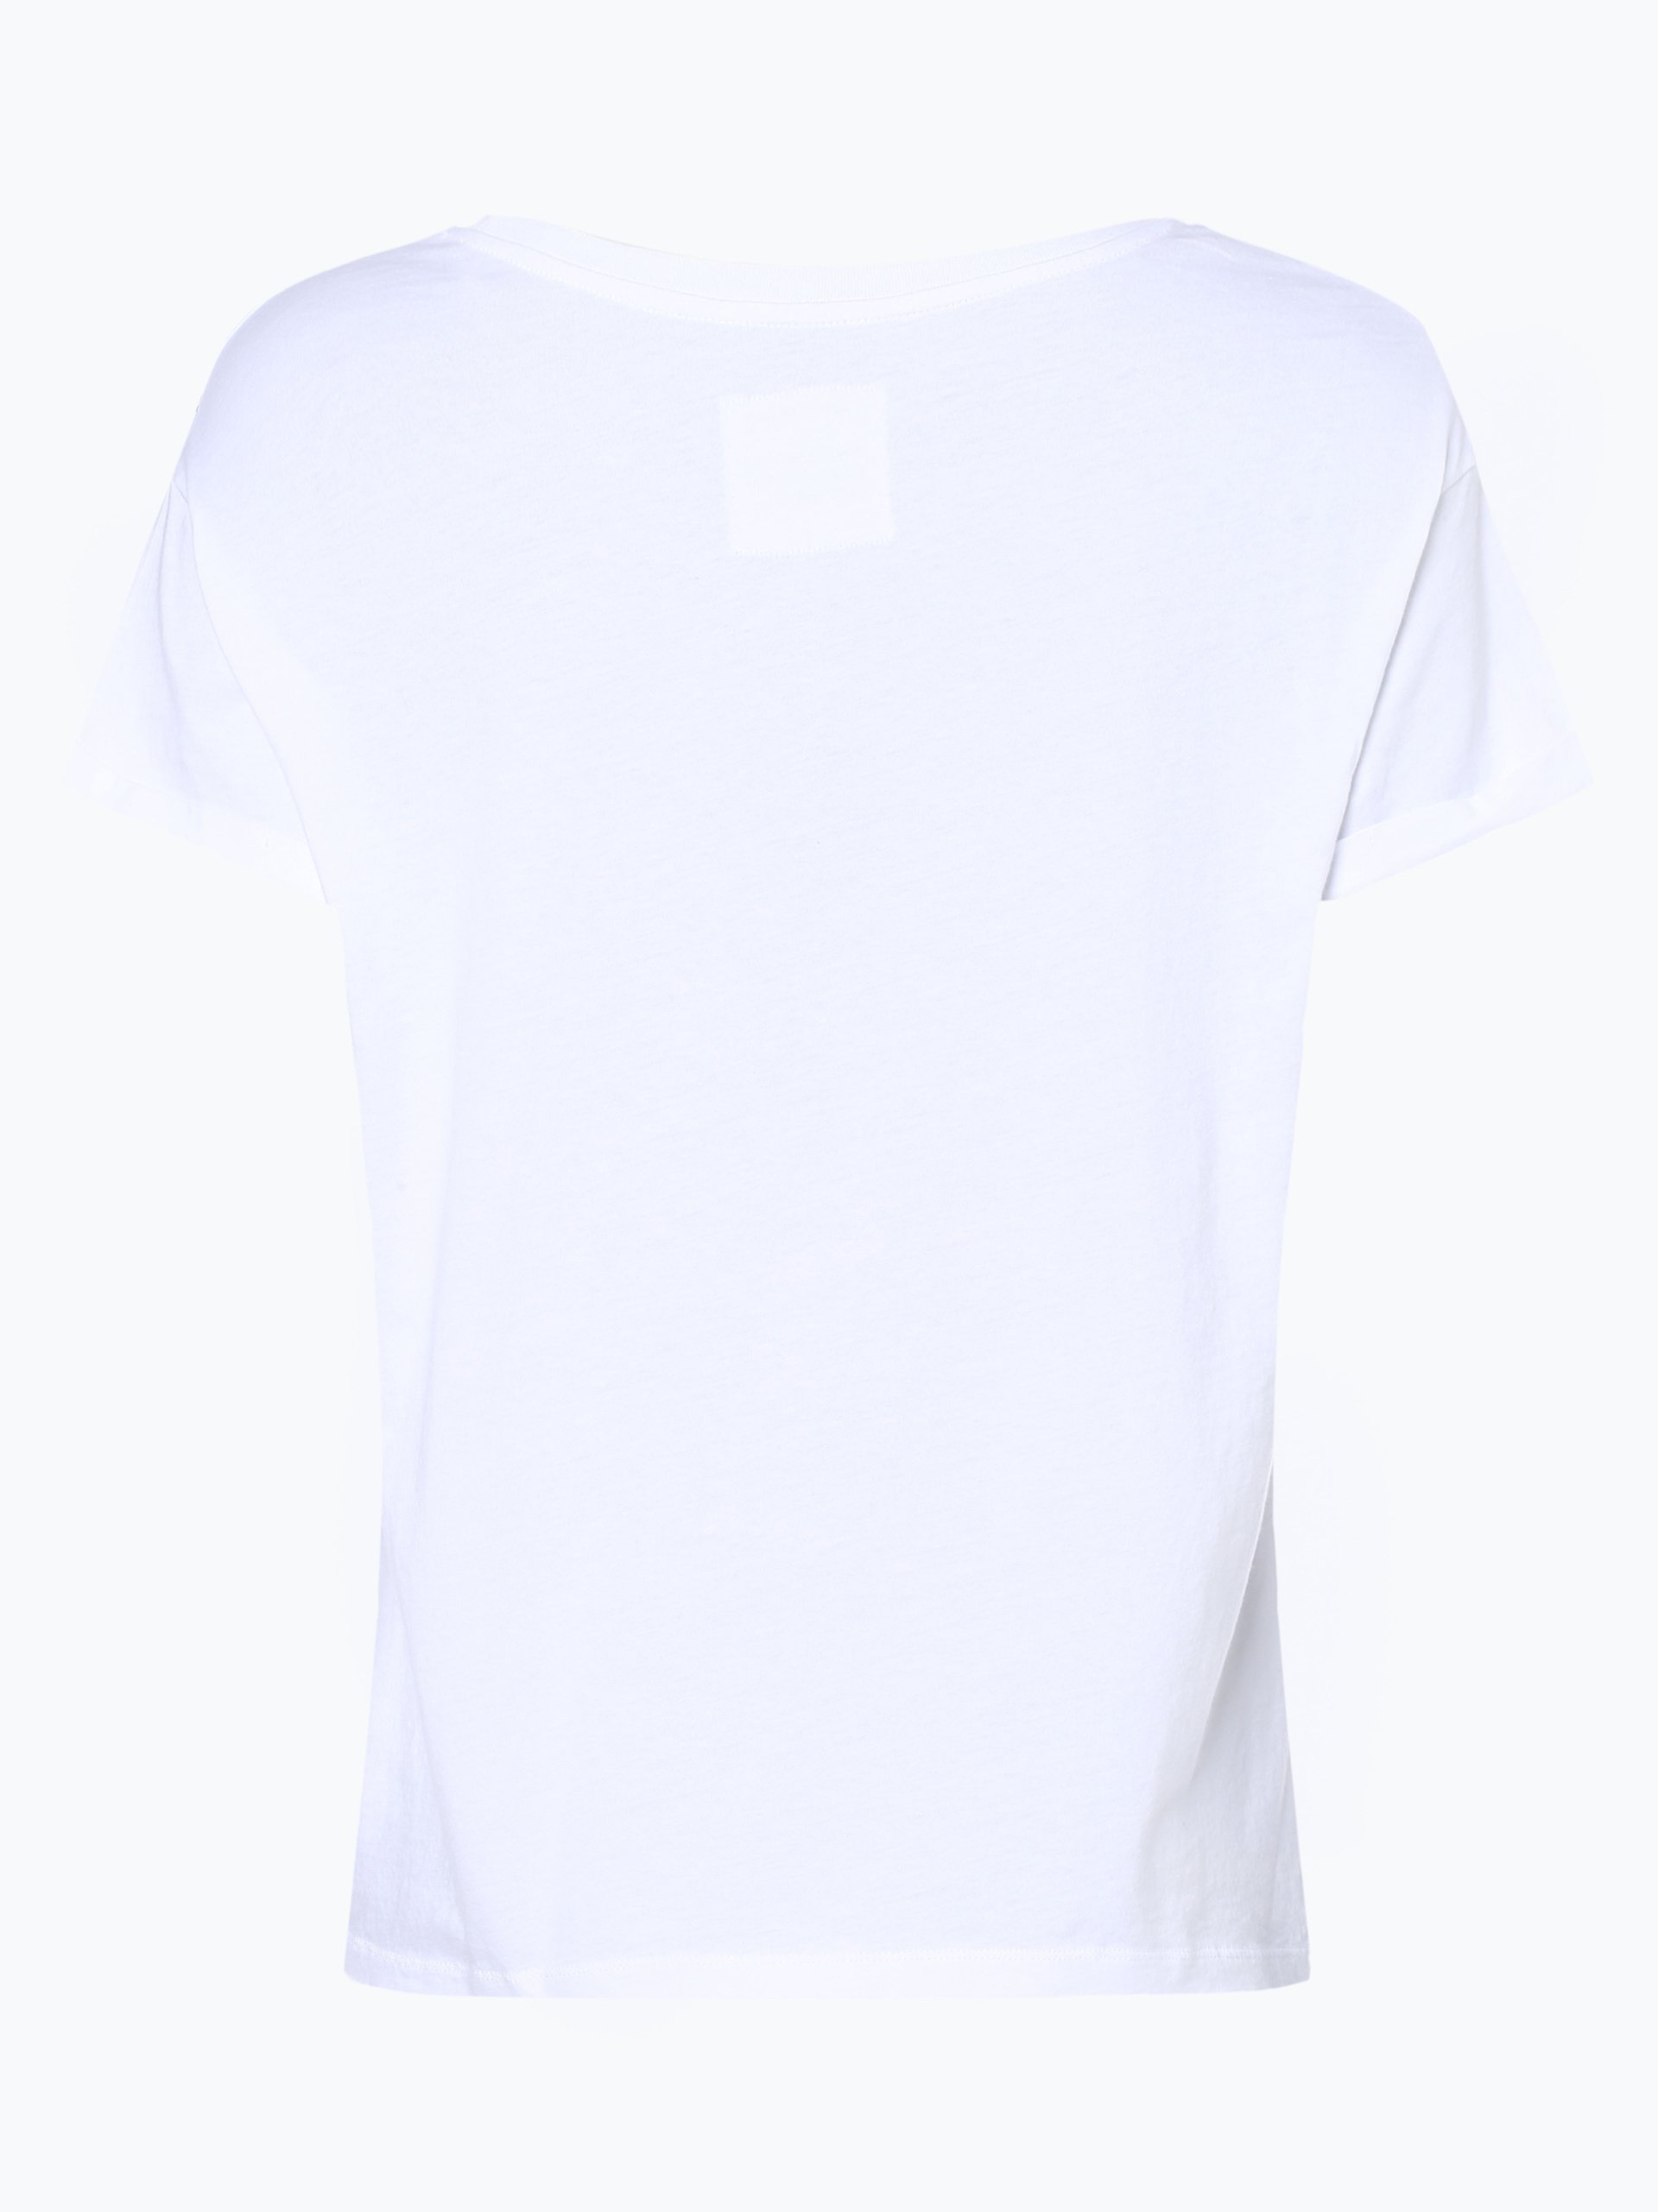 ARMEDANGELS Damen T-Shirt - Nalin Cranes in The Sky